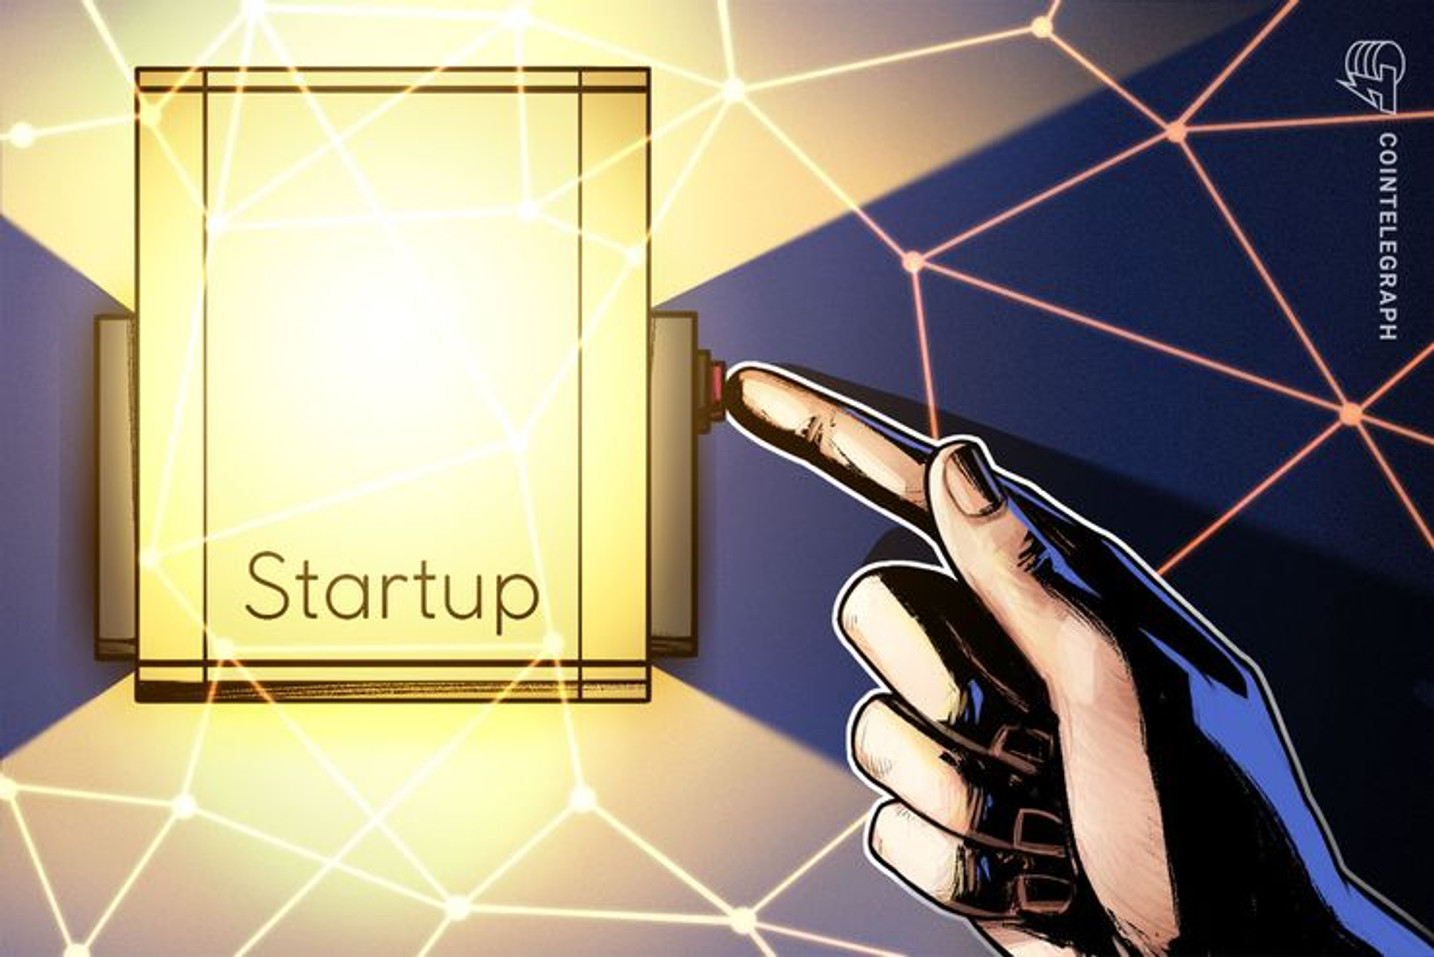 Certificadora digital brasileira Valid adquire 51% da fintech blockchain Blupay